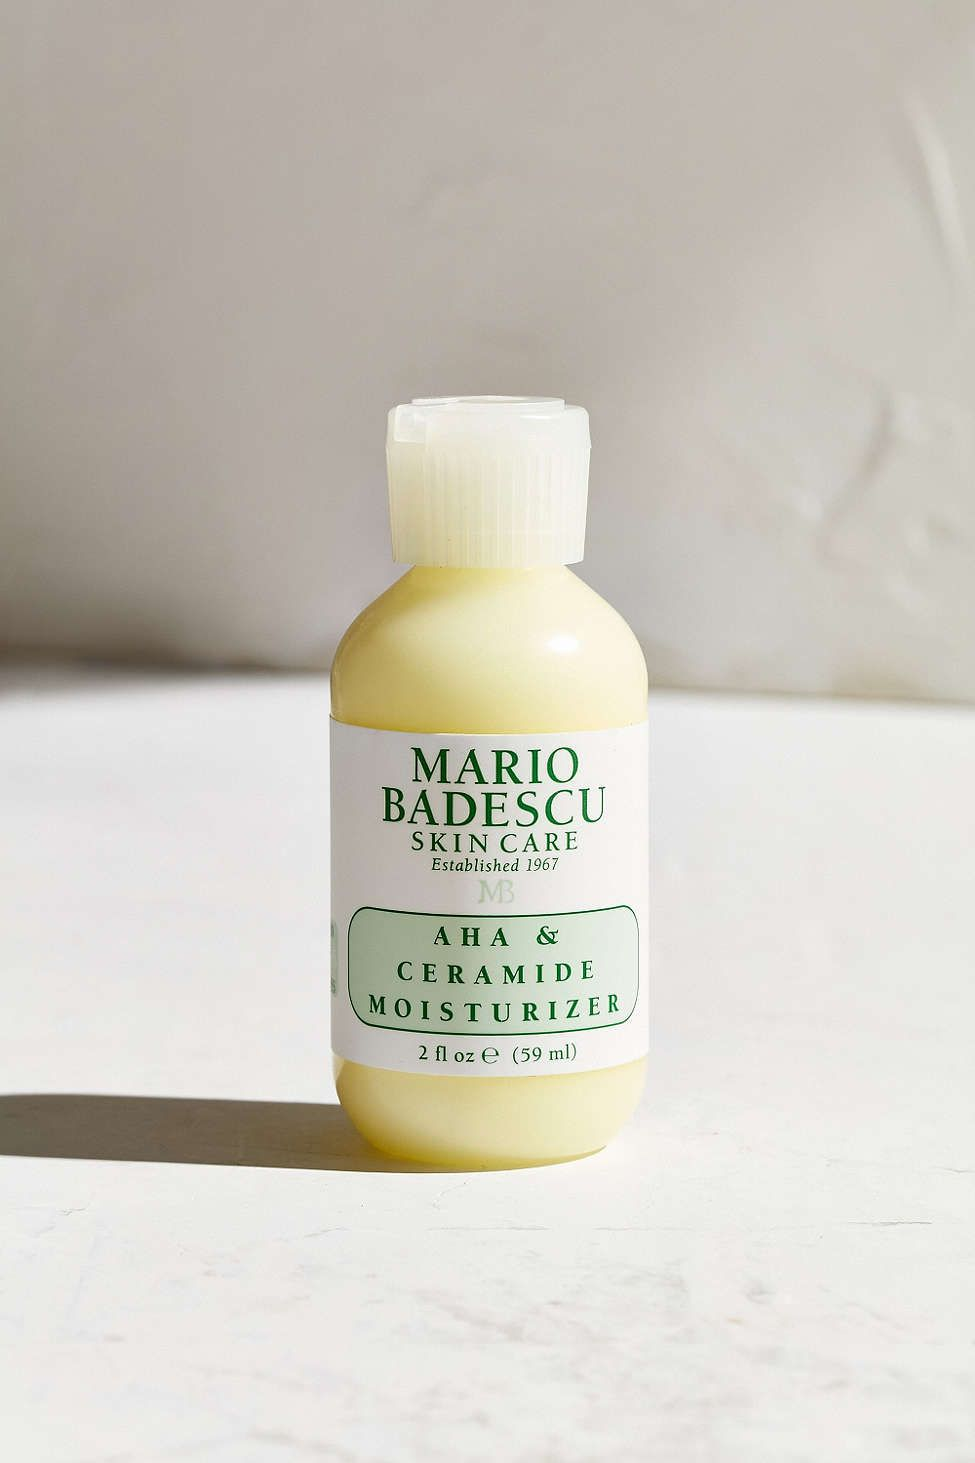 Mario Badescu Aha Ceramide Moisturizer Moisturizer Congested Skin Collagen Moisturizer